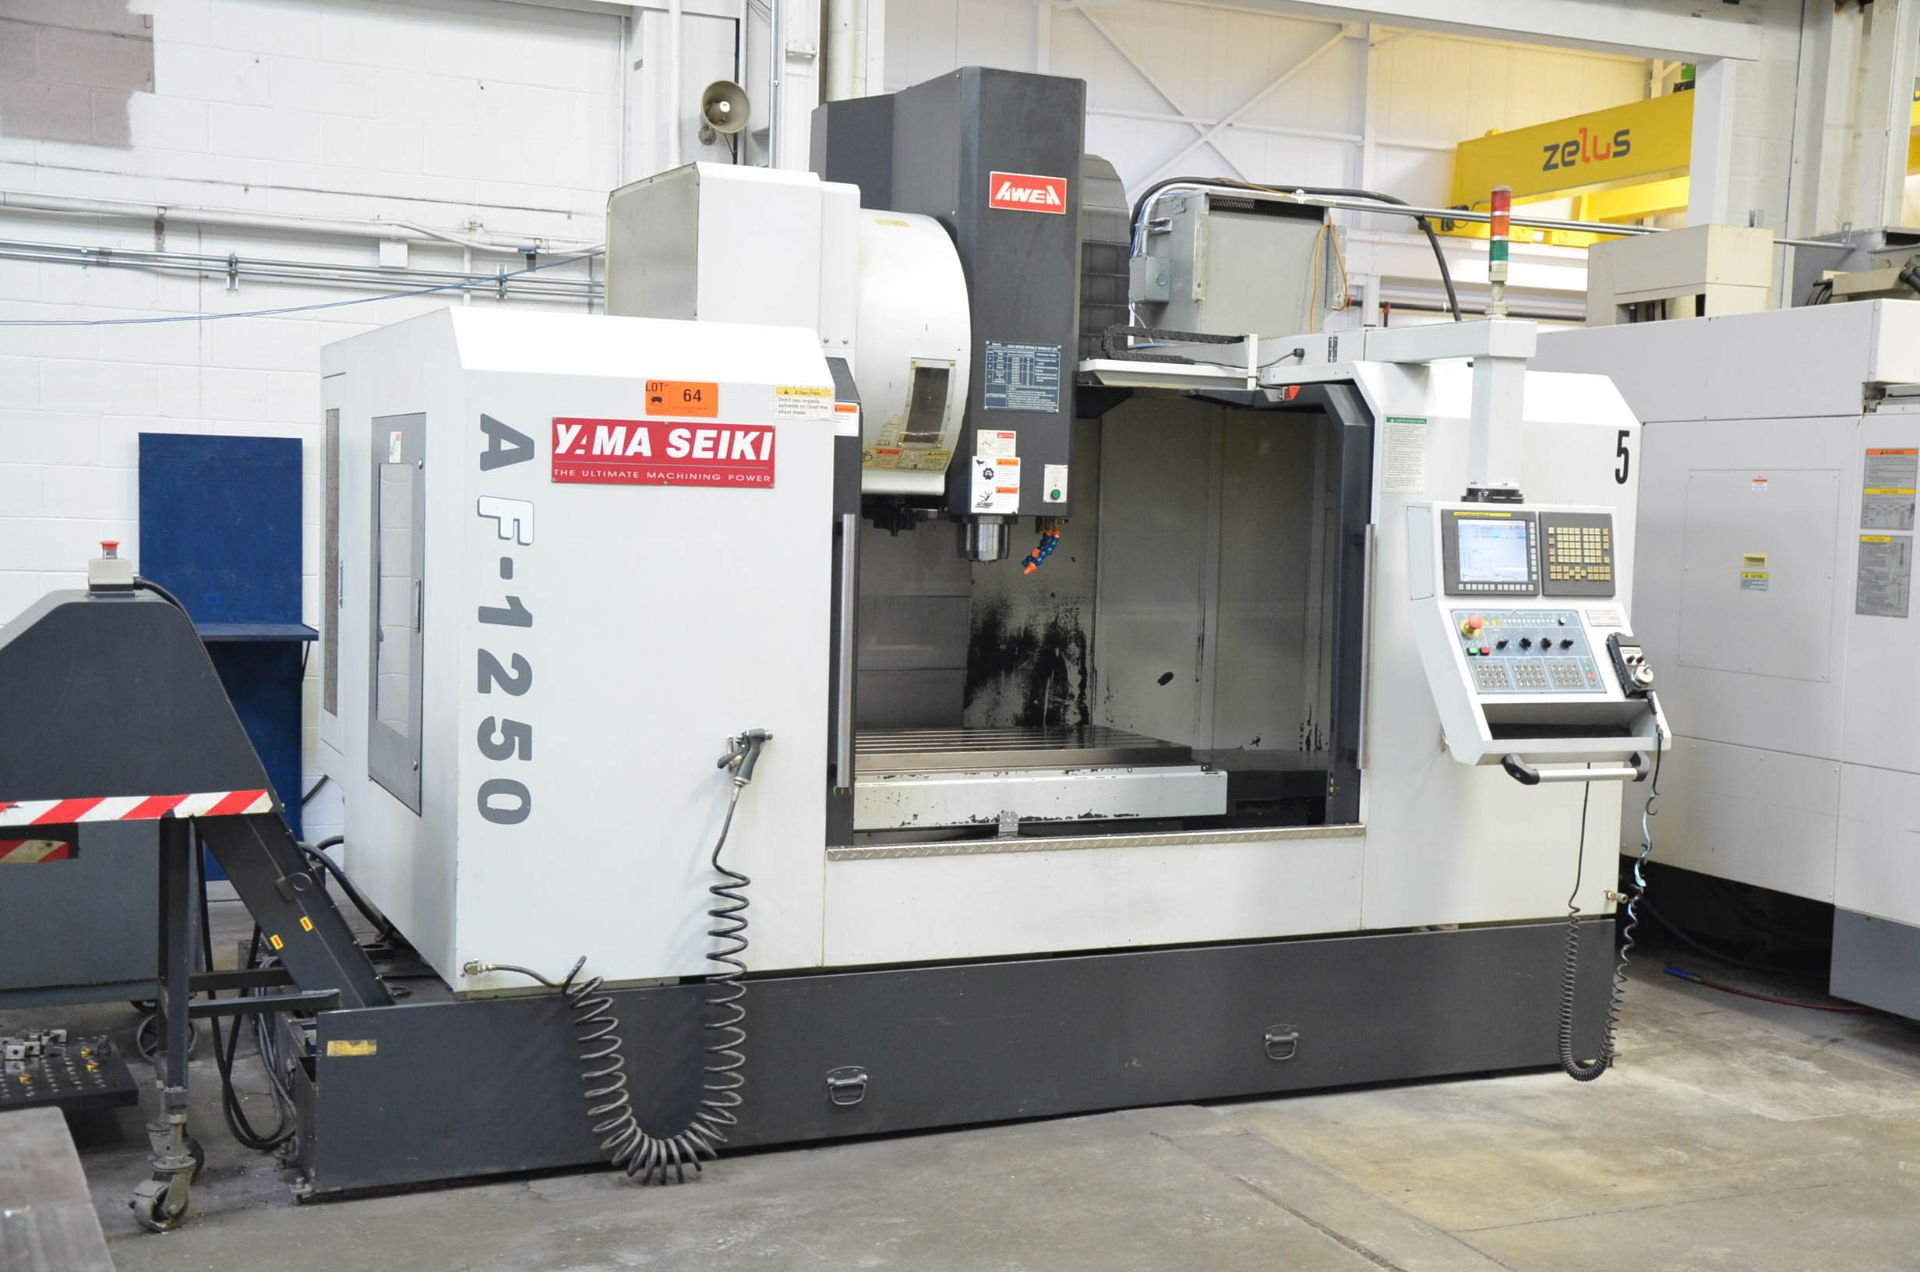 AWEA YAMA SEIKI (2012) AF-1250 CNC VERTICAL MACHINING CENTER WITH FANUC SERIES 31I-MODEL B CNC - Image 2 of 10